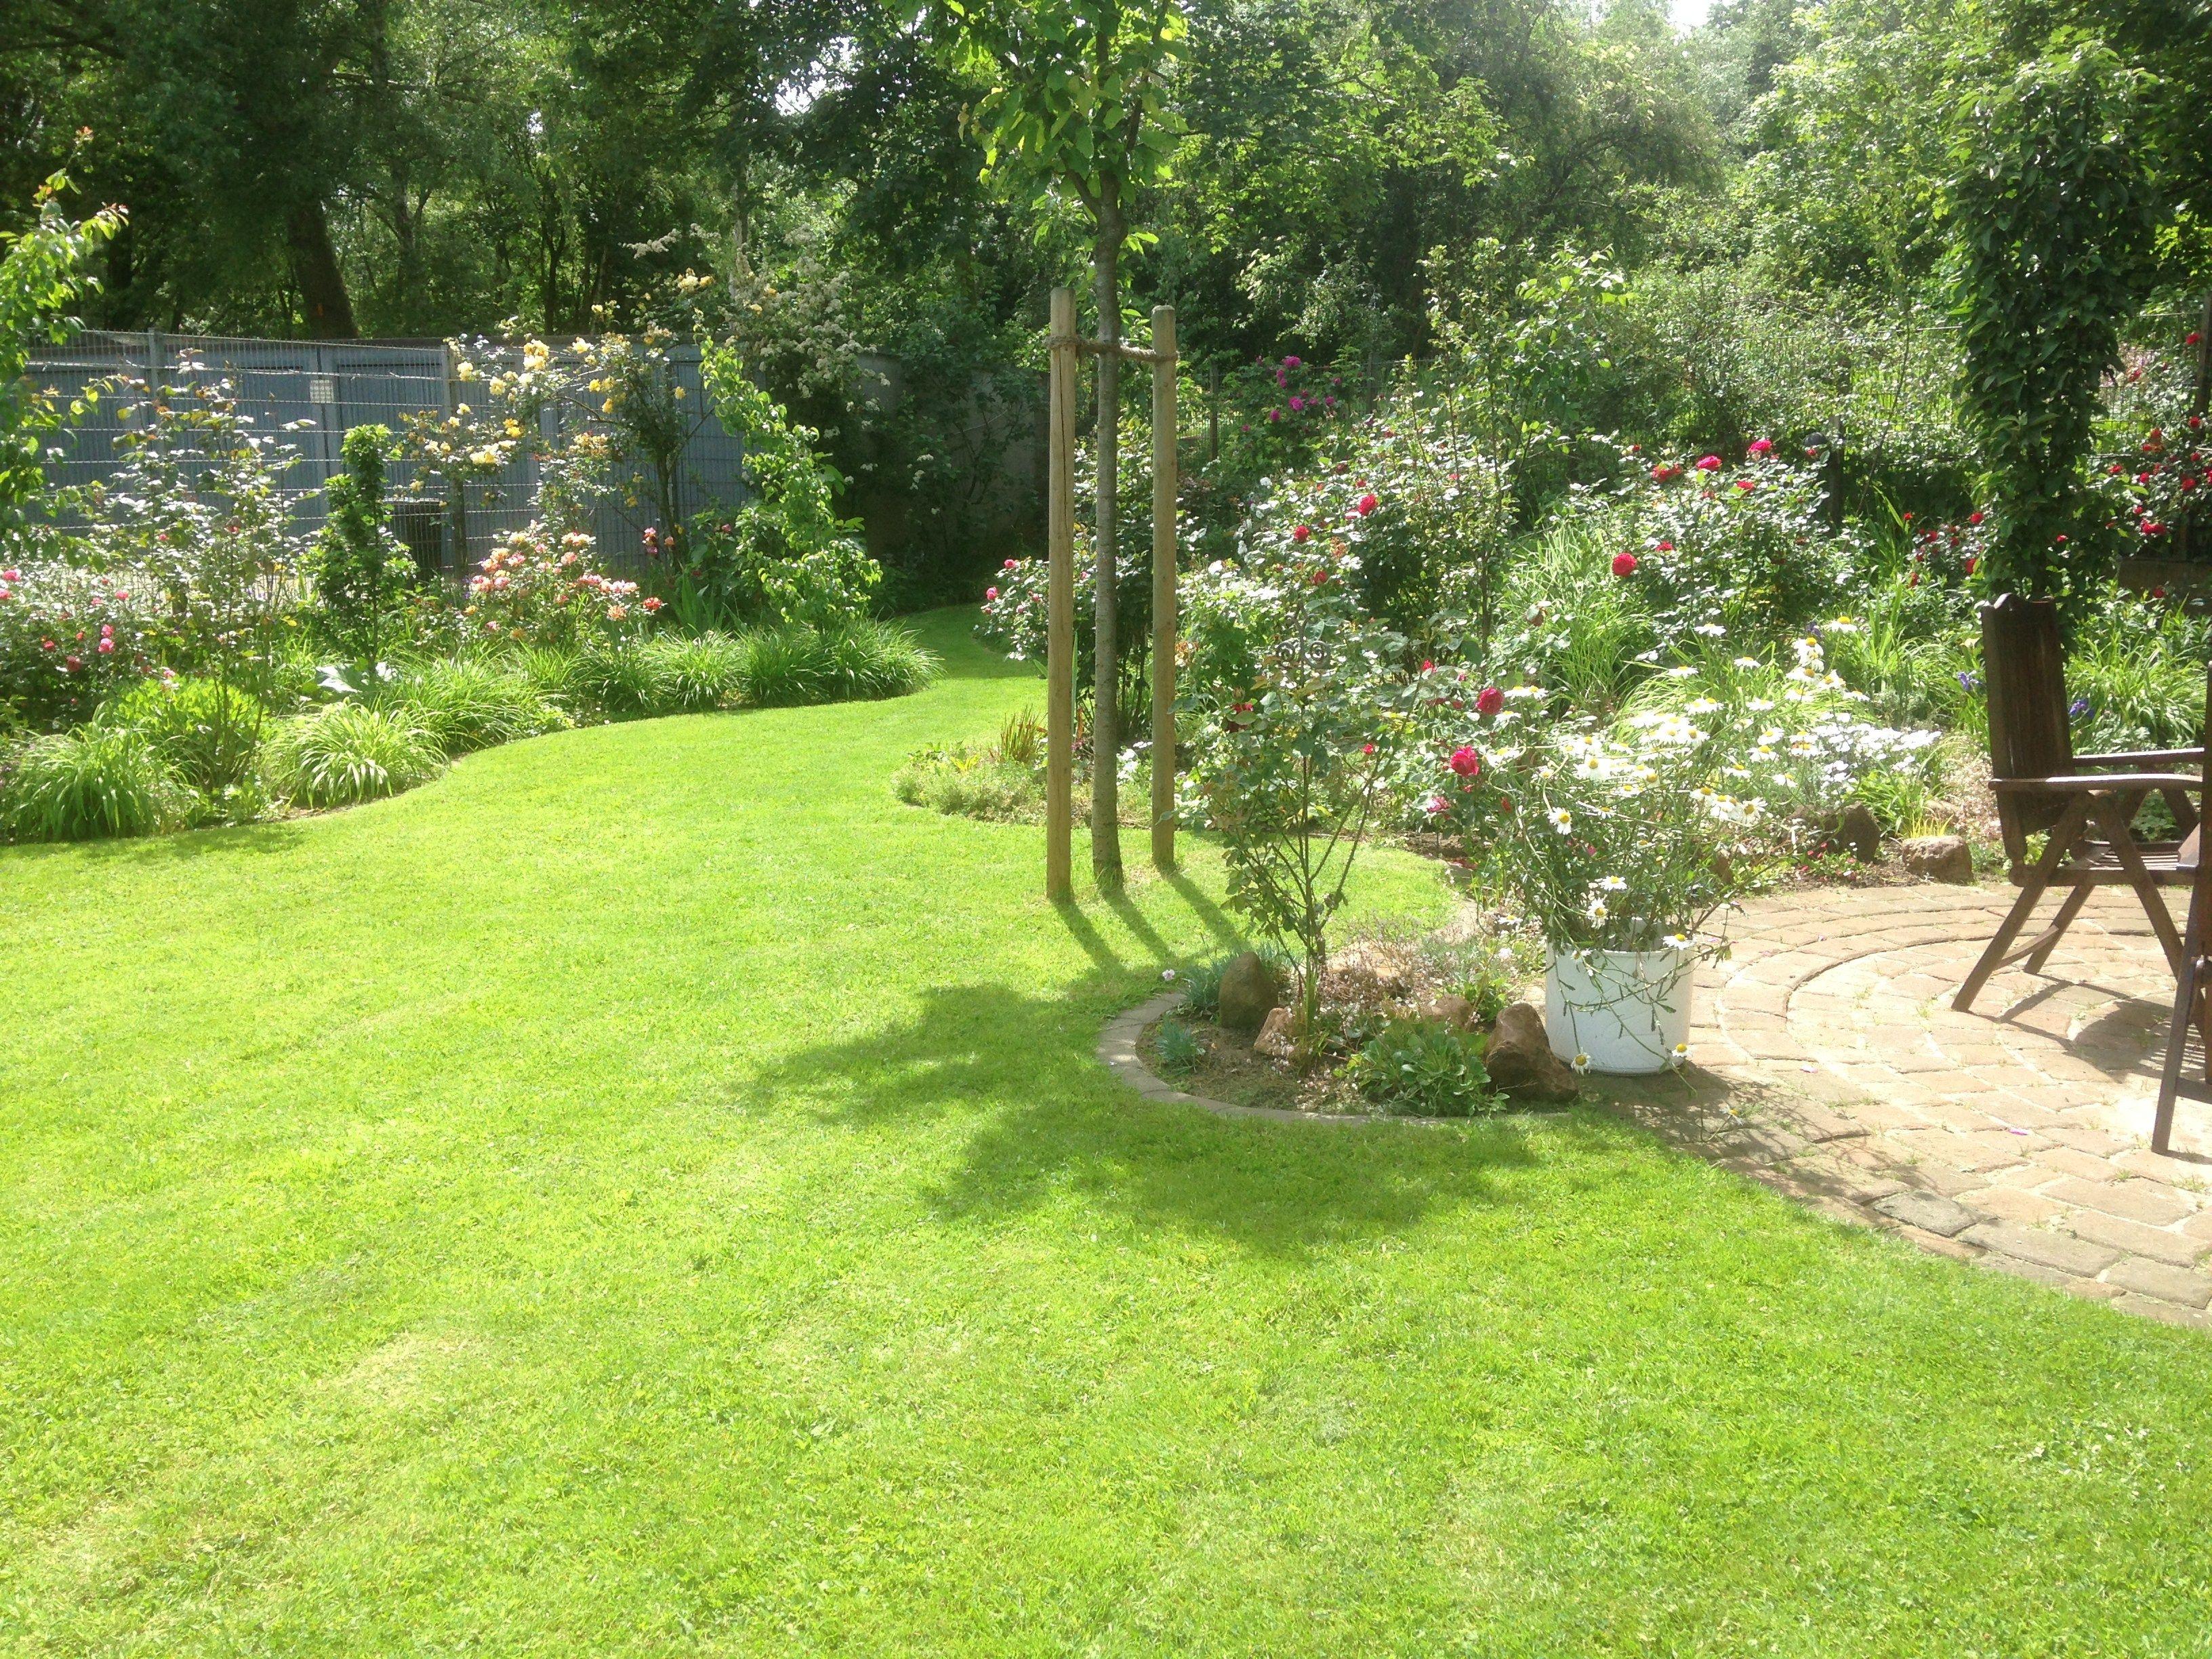 Einzigartig Cottage Garten Anlegen Ideen